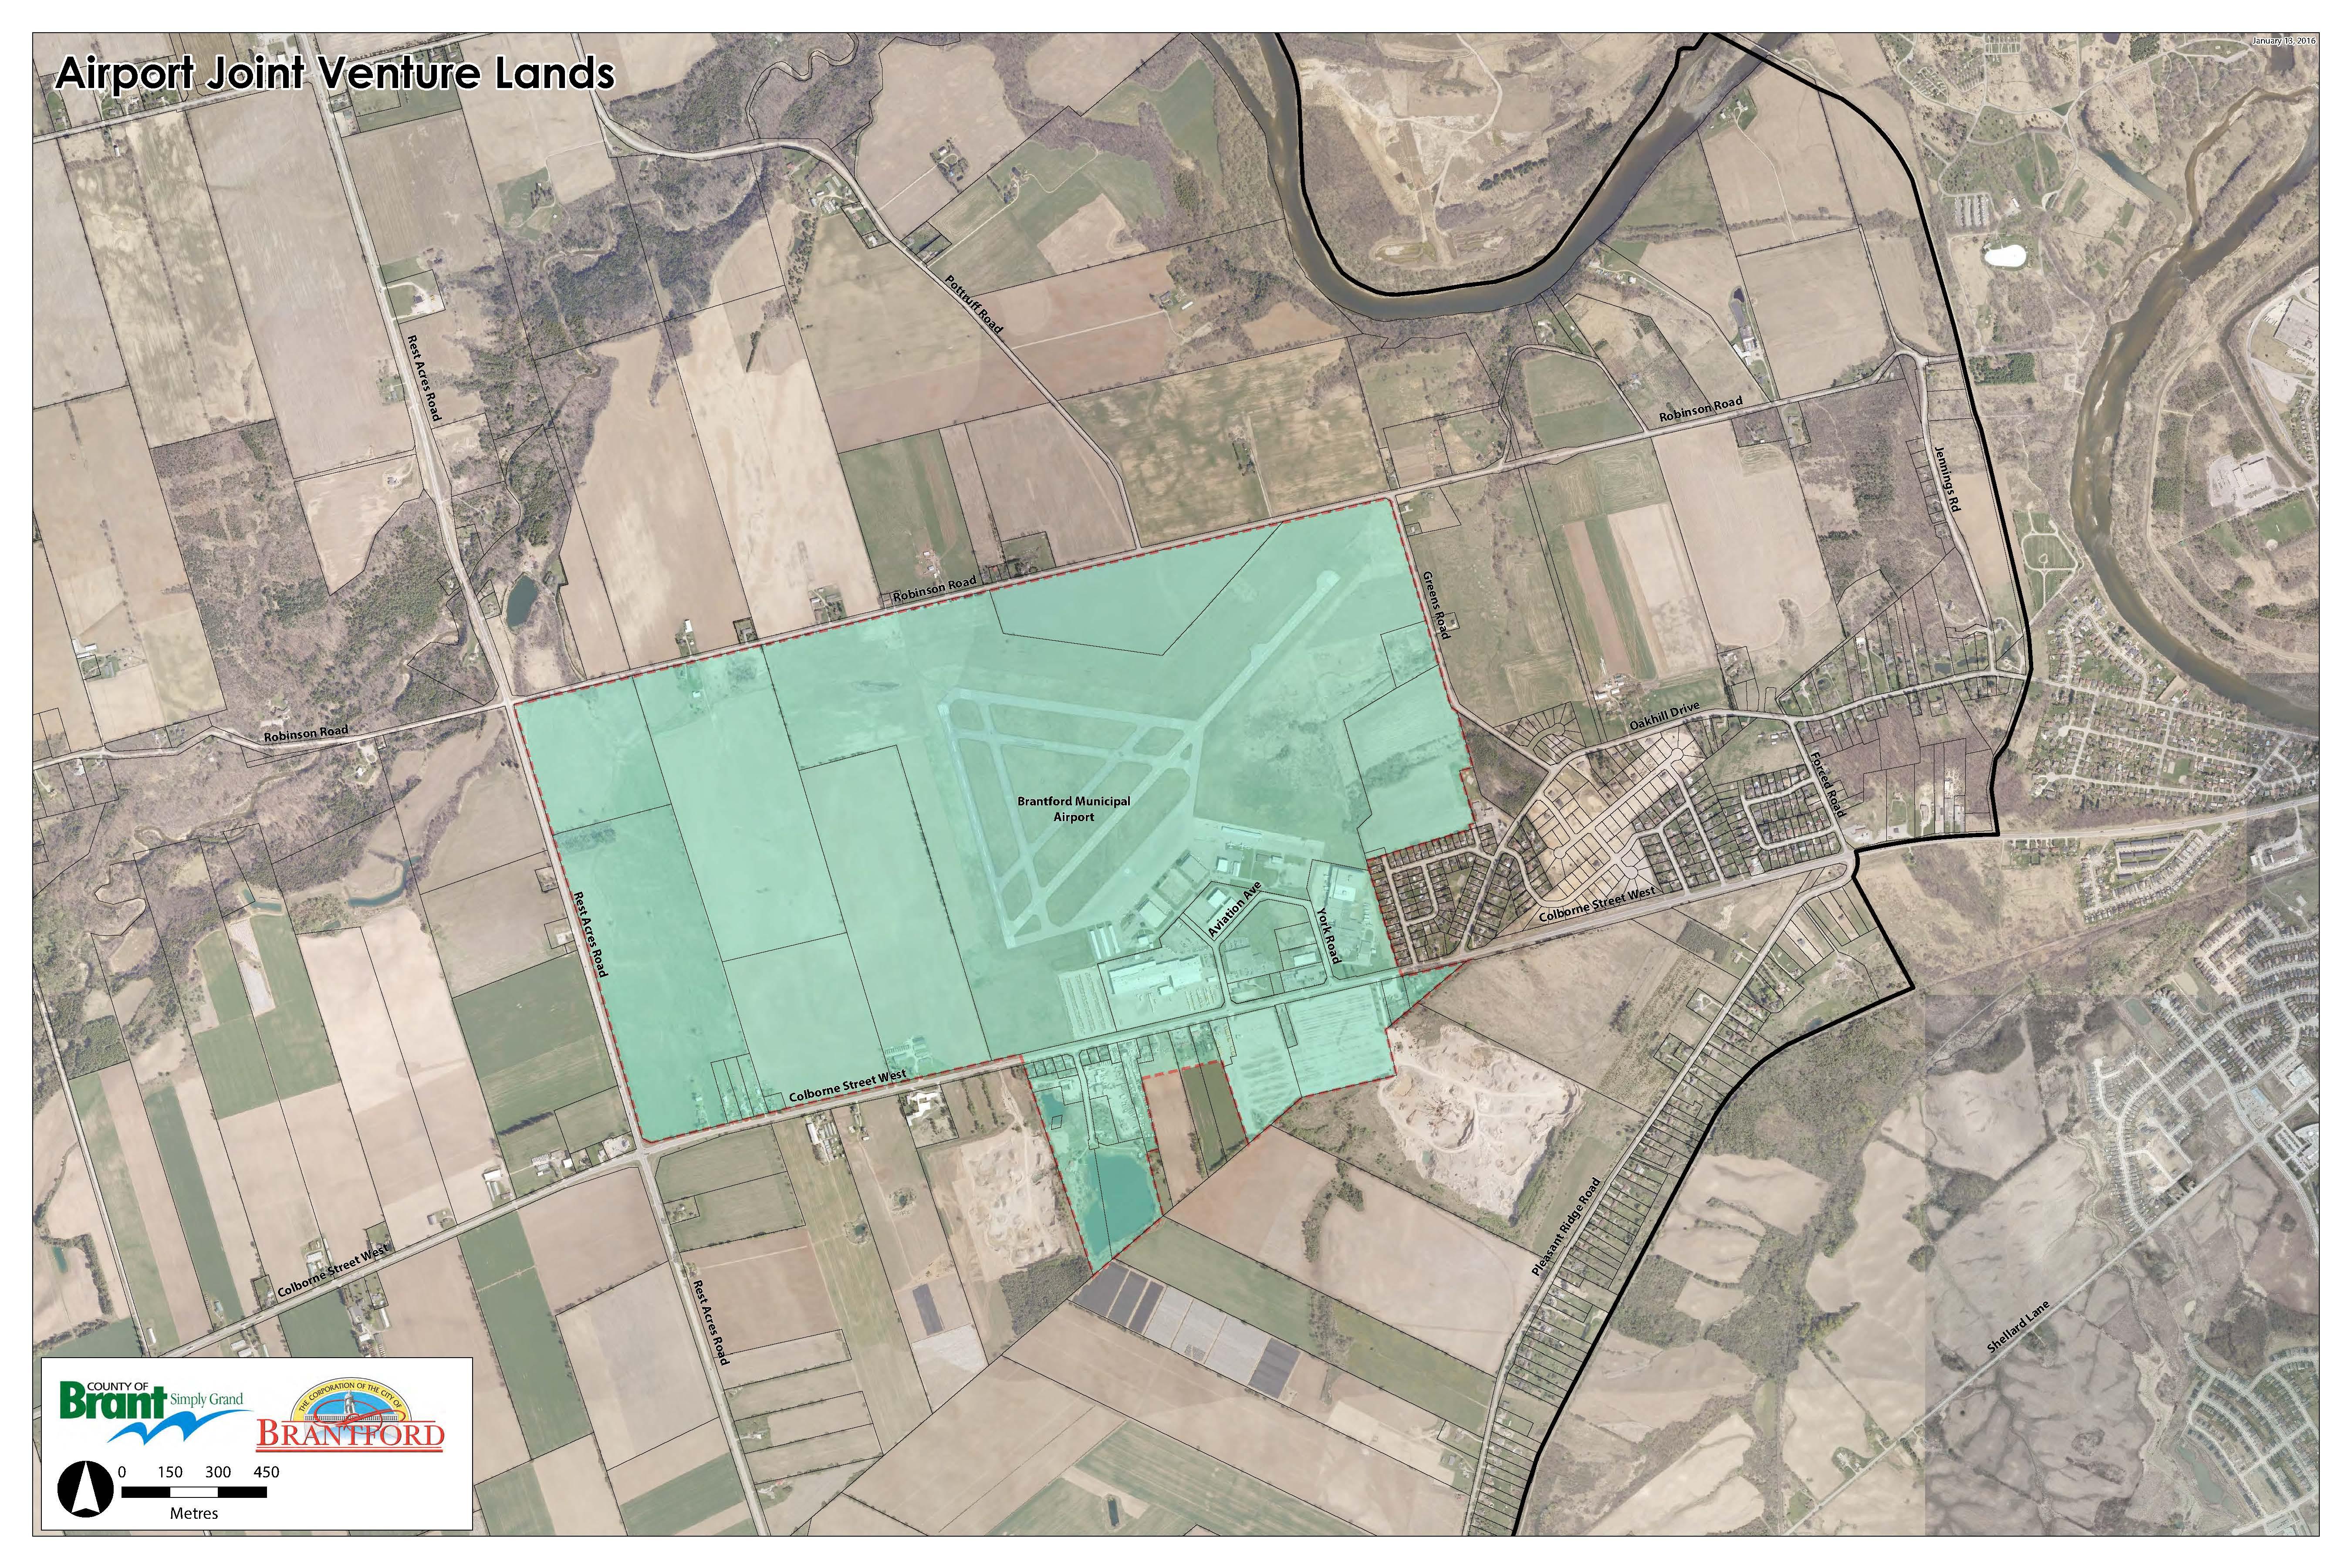 Brantford Boundary Agreement Maps